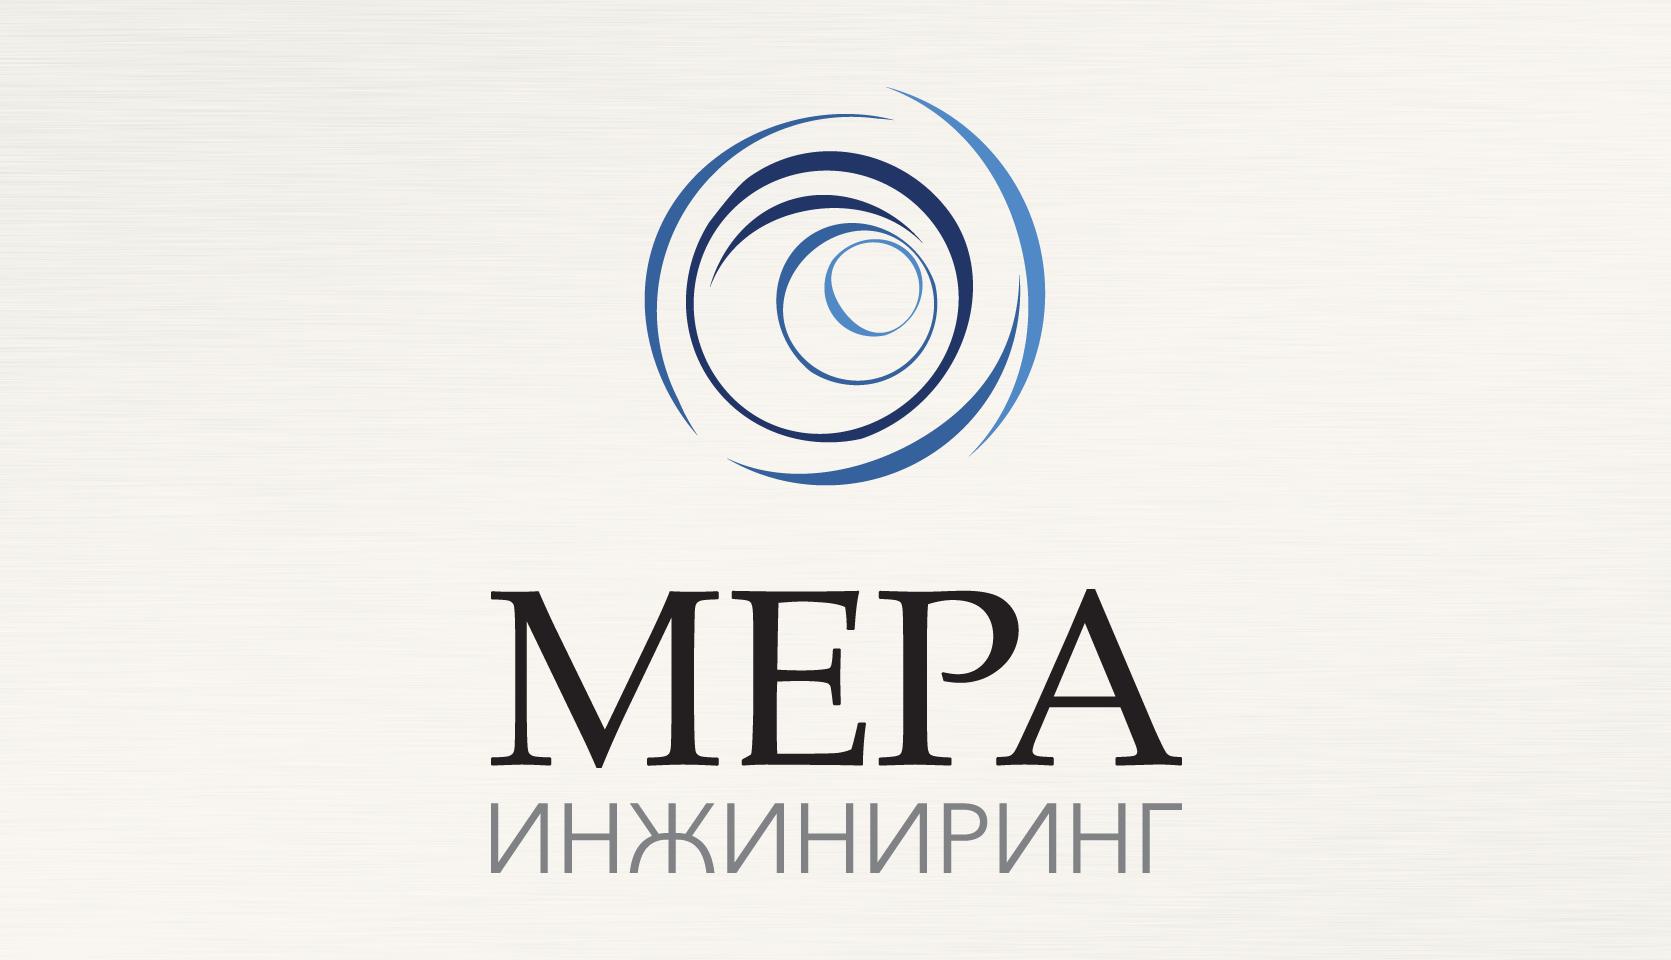 МЕРА Инжиниринг